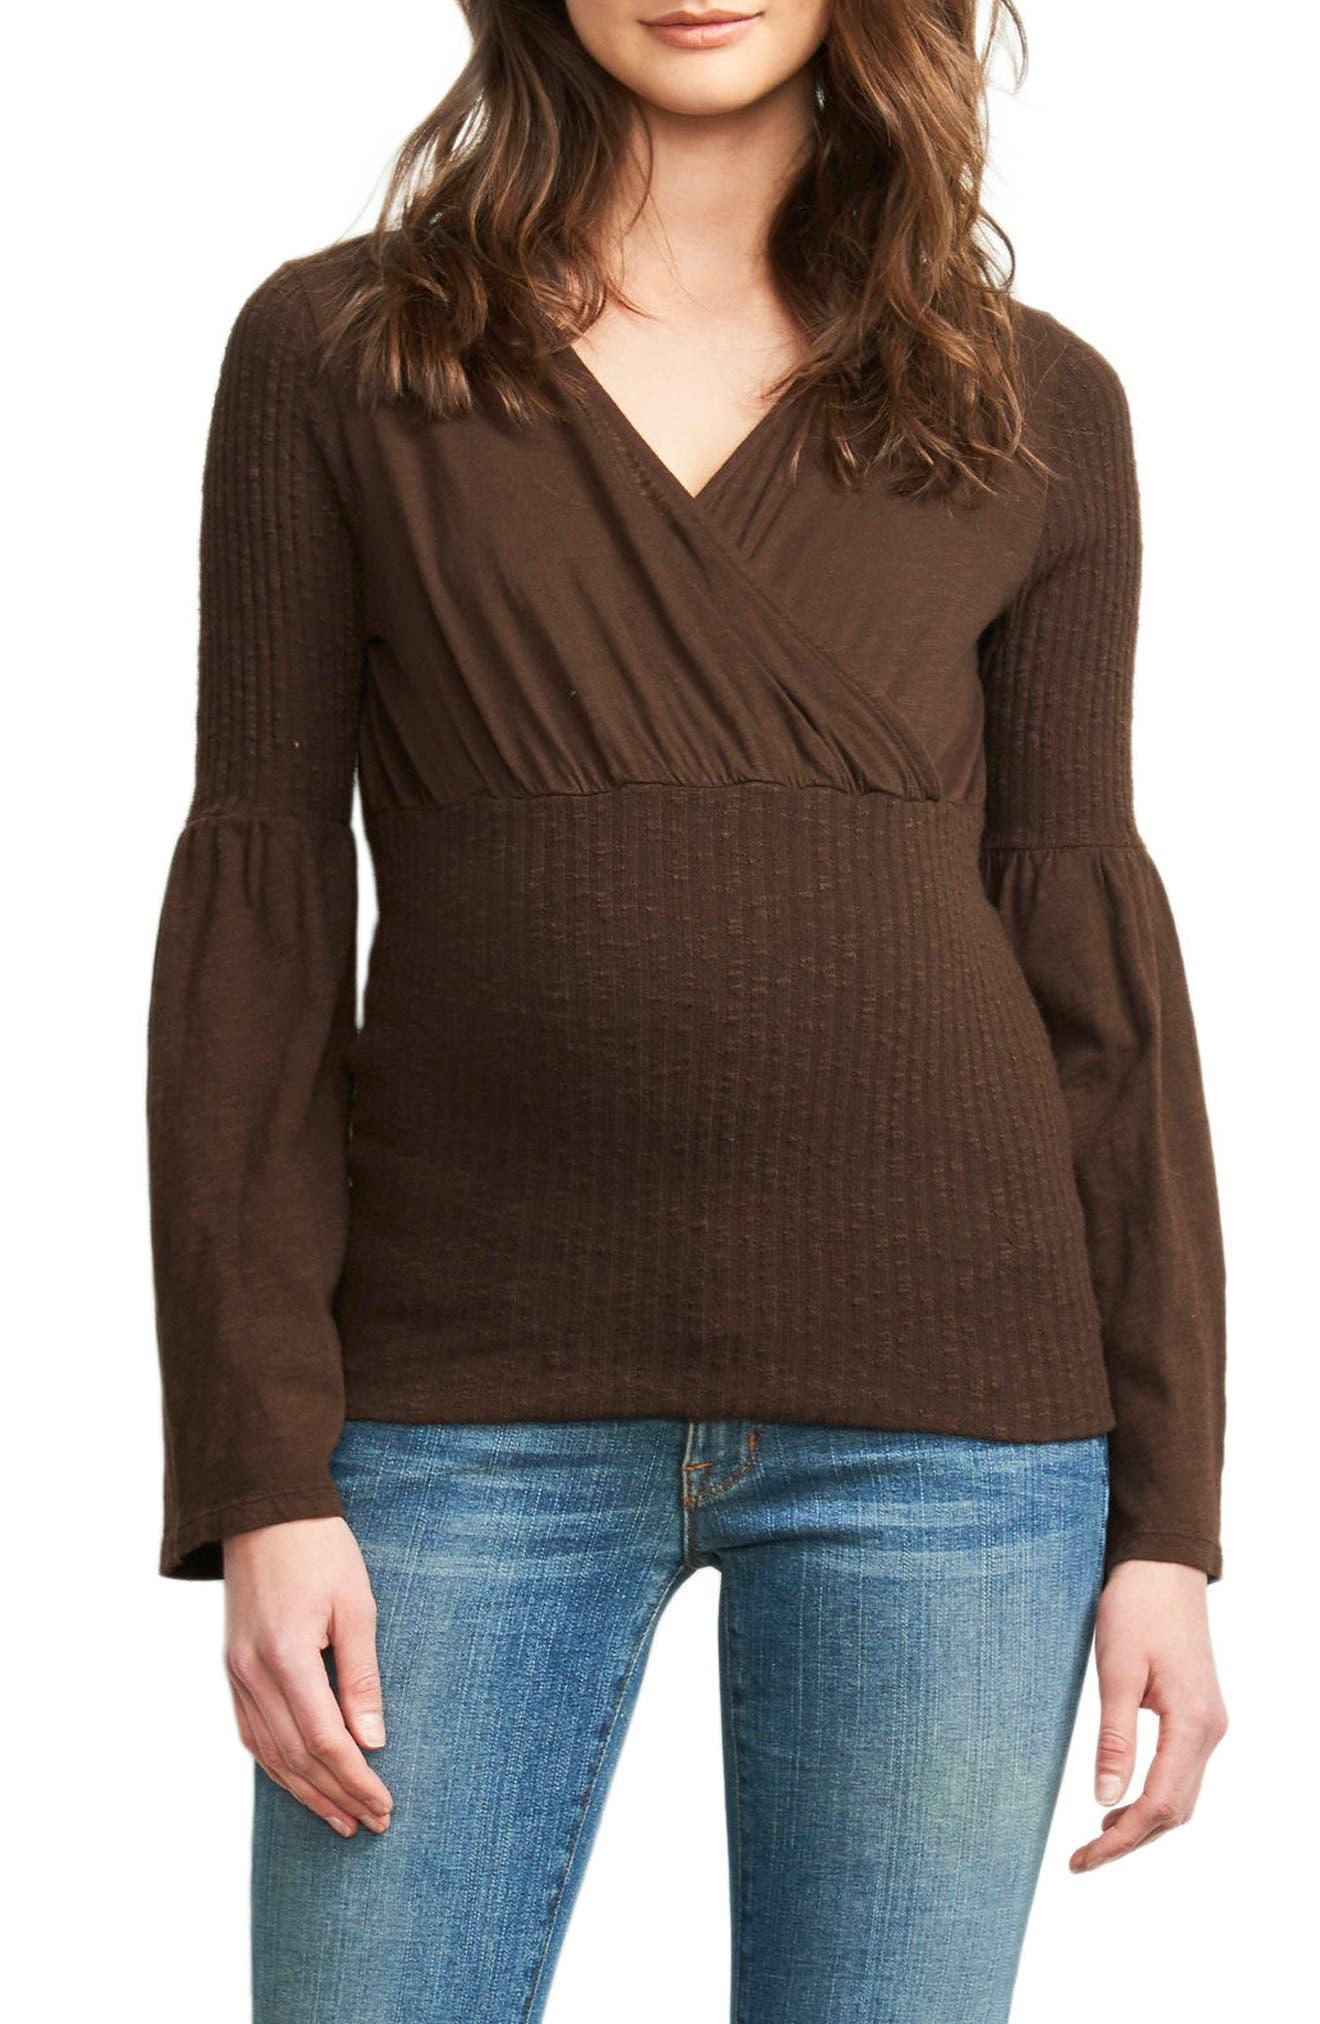 Belly Hug Knit Maternity Top,                             Main thumbnail 1, color,                             CHOCOLATE